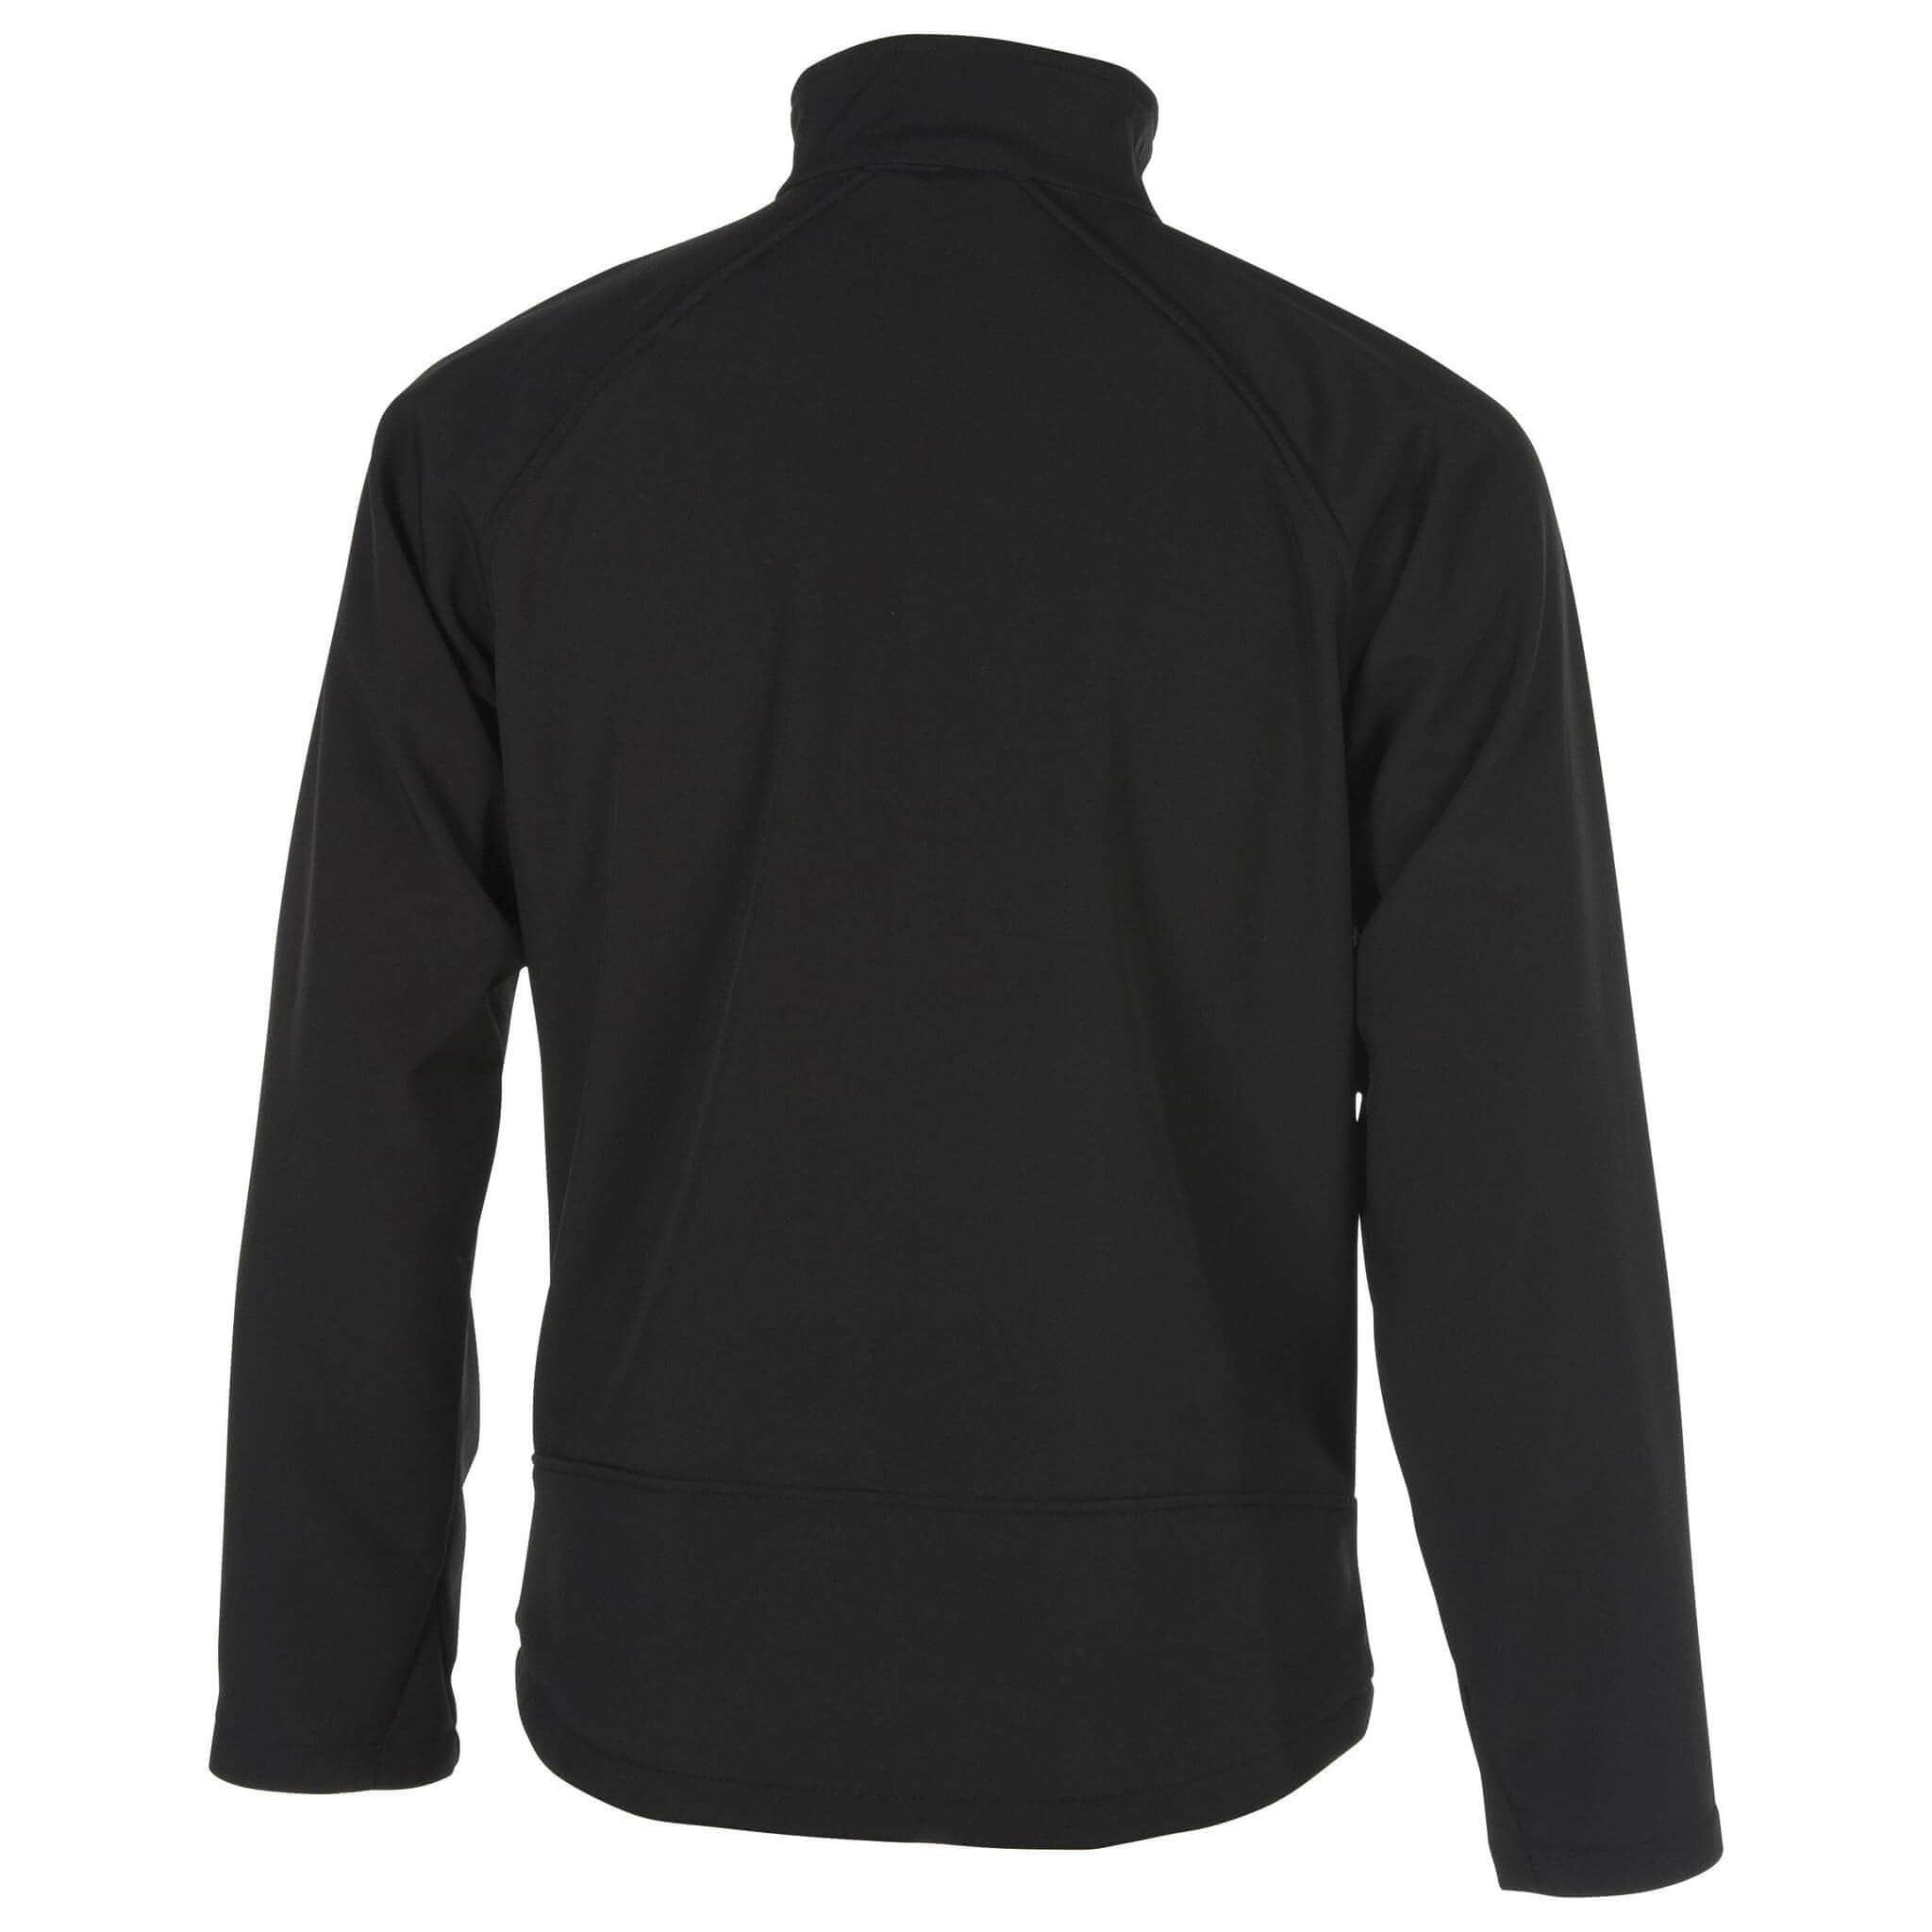 chaqueta plymouth negra parte de atrás